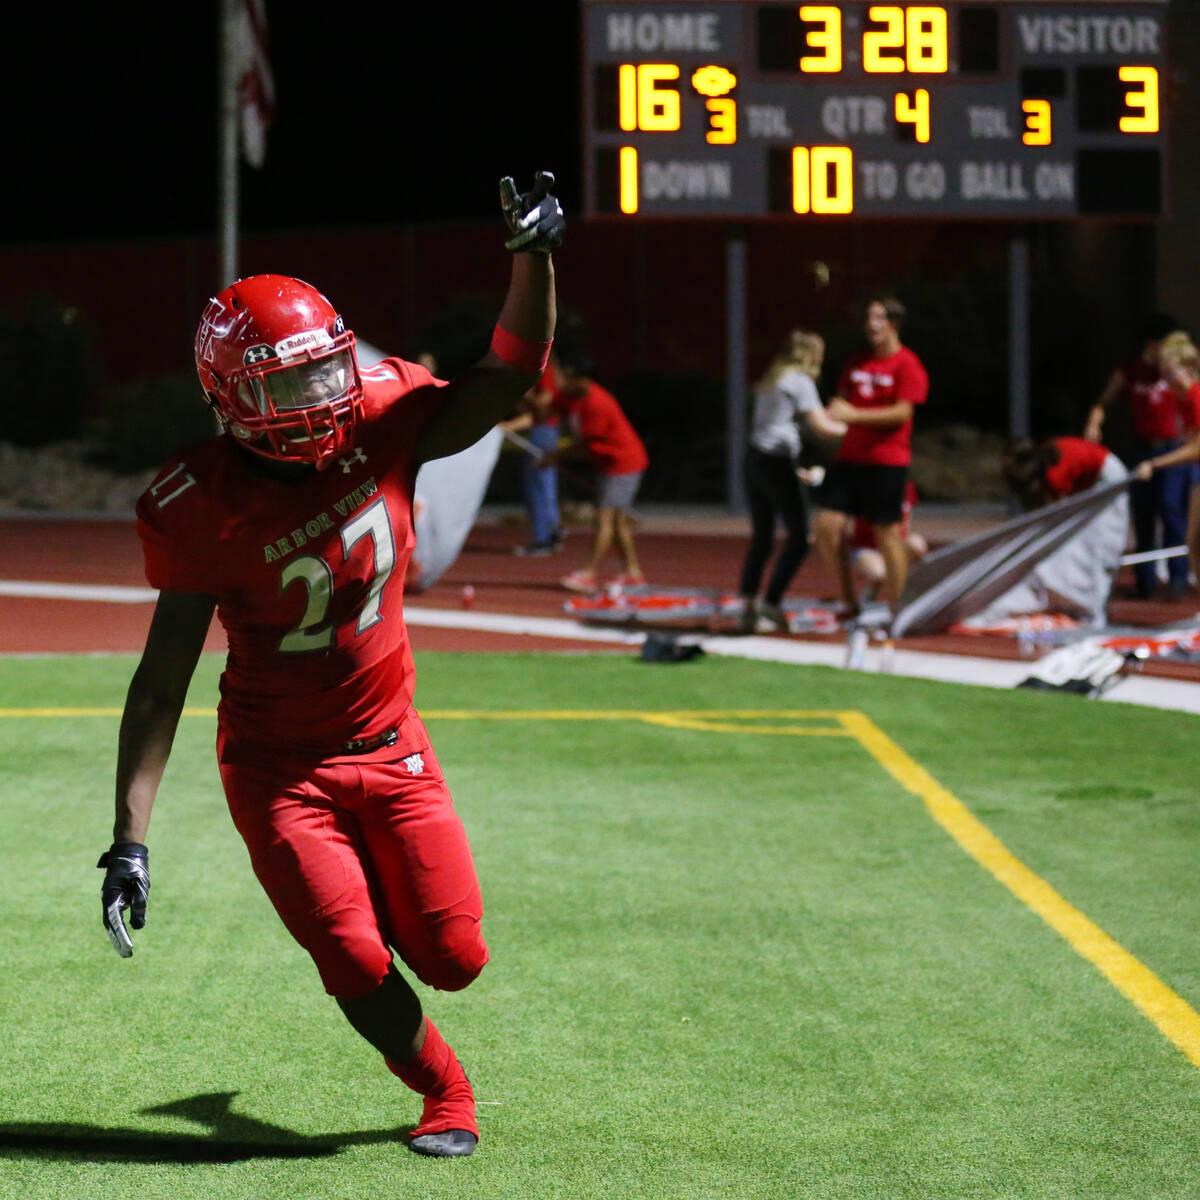 Arbor View's Makhai Donaldson(27) celebrates a touchdown during the fourth quarter of a footb ...